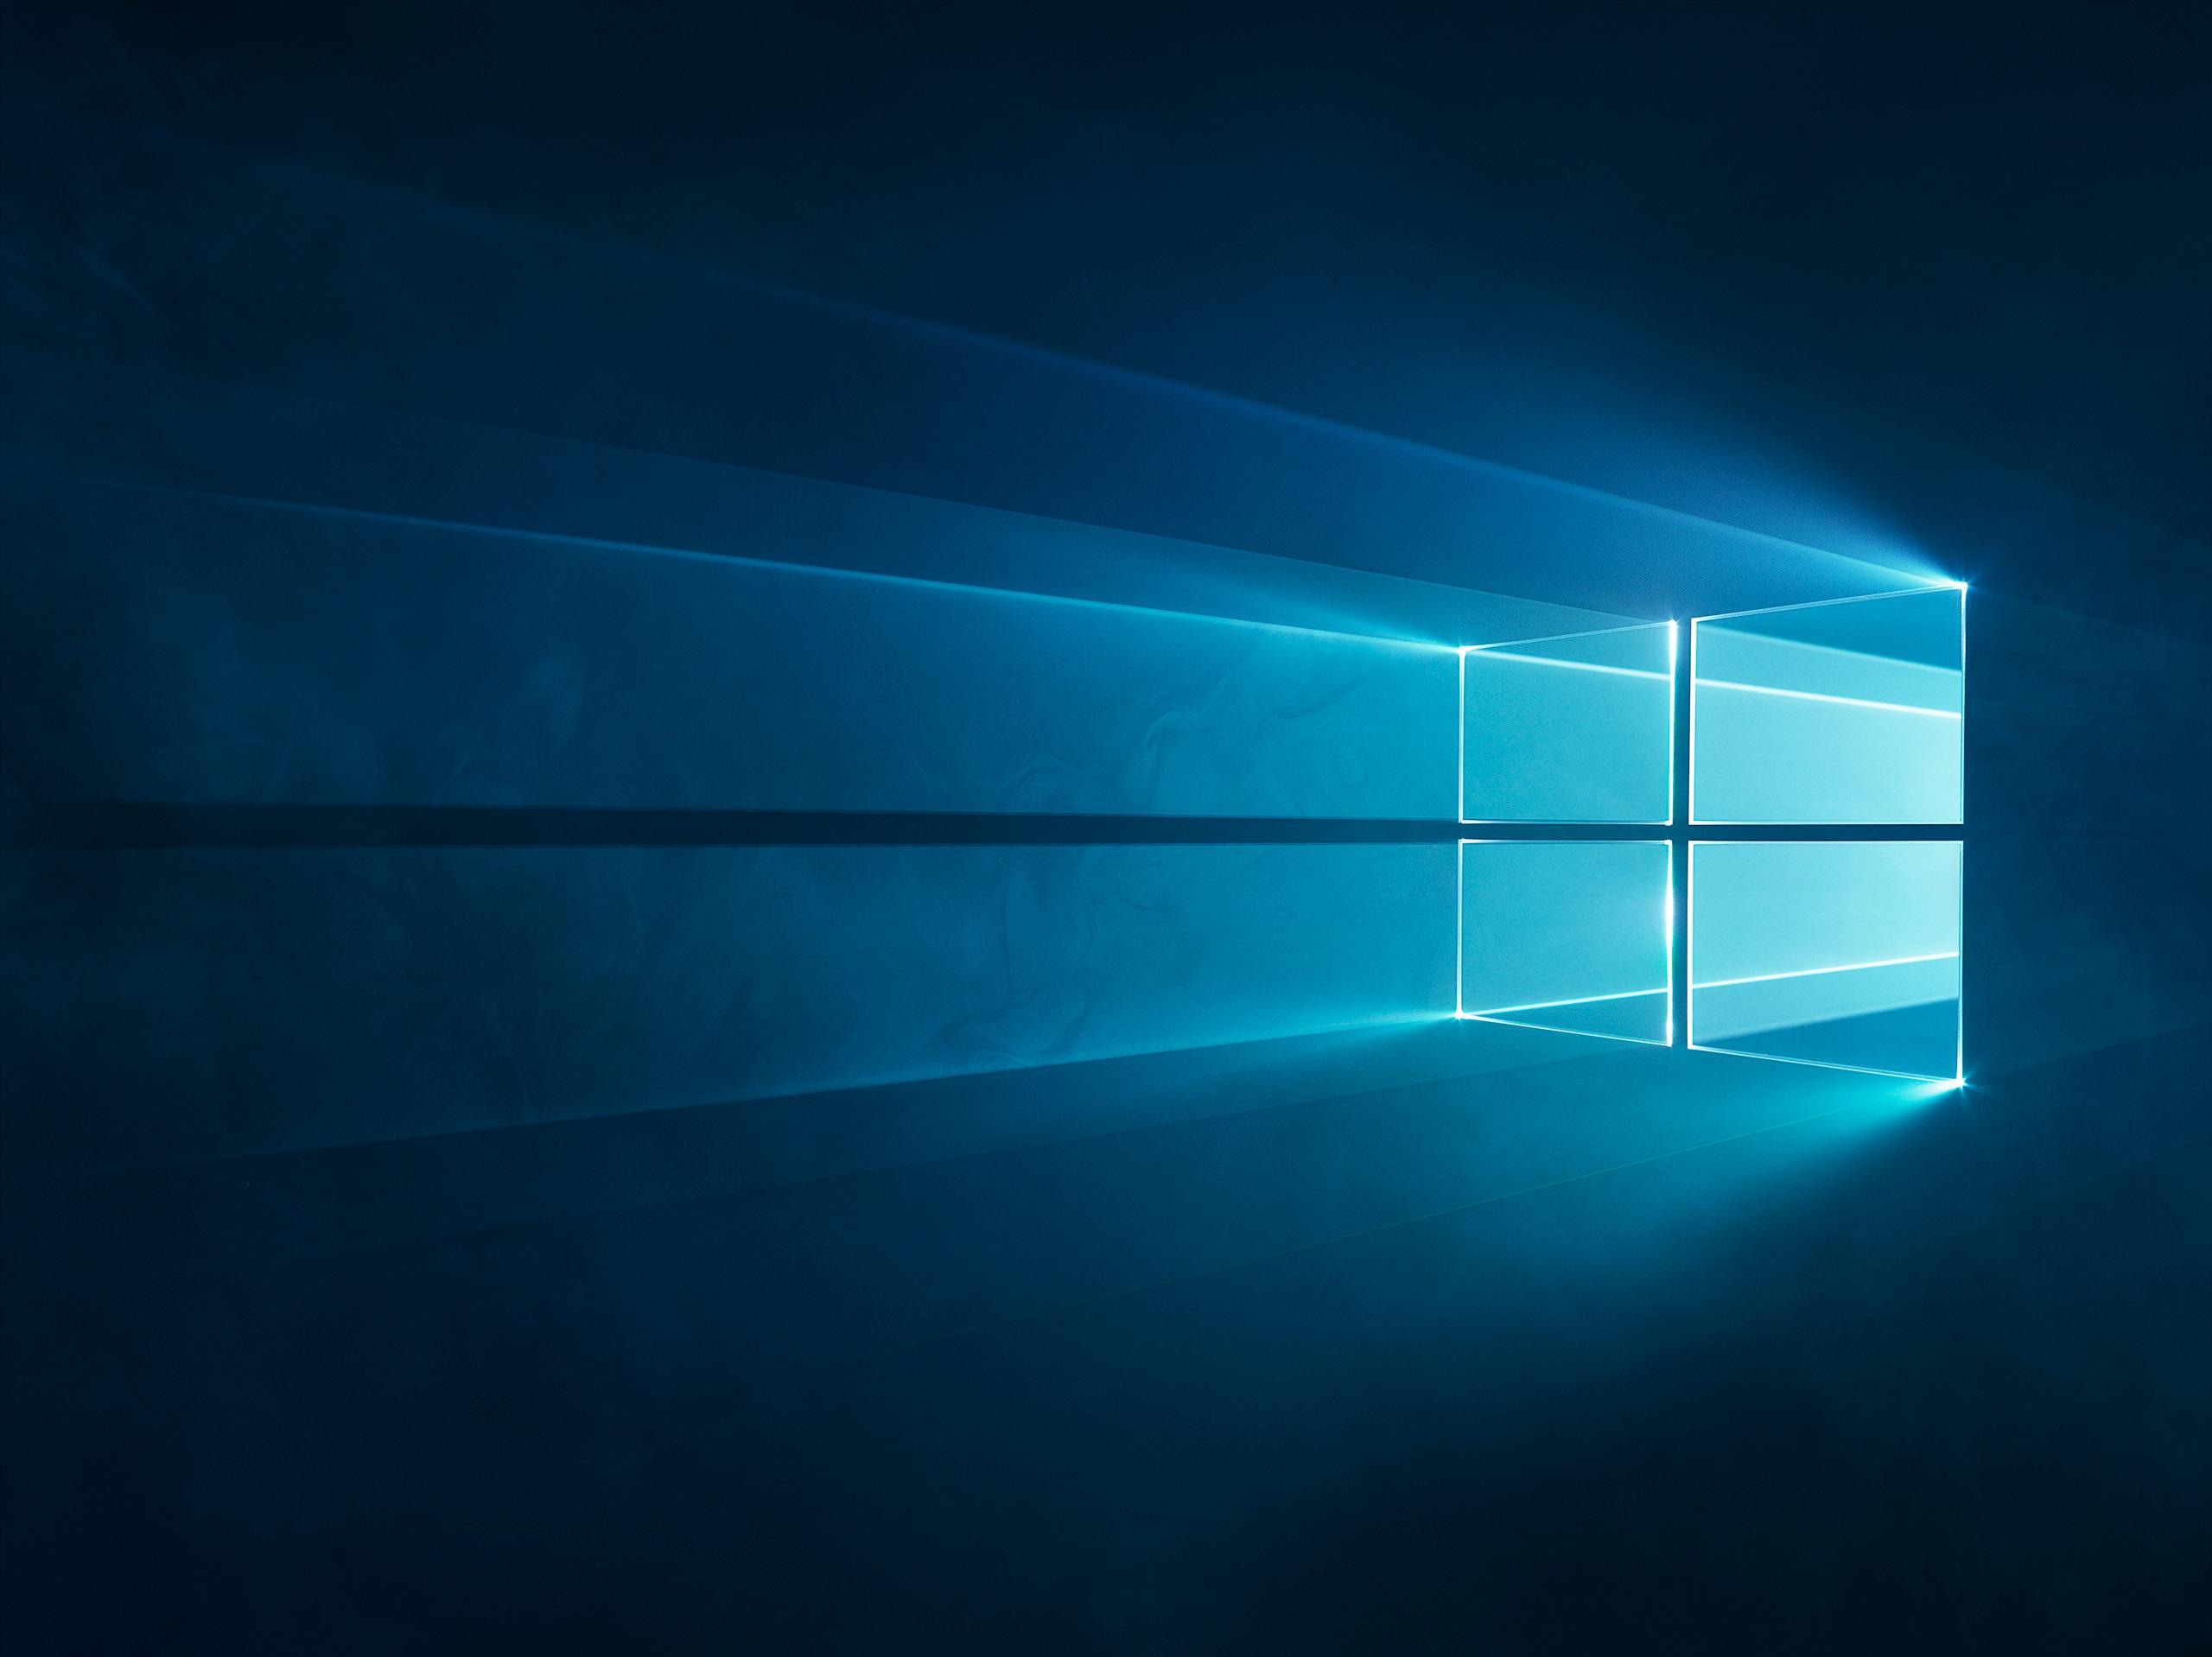 download powerpoint 2016 windows 10